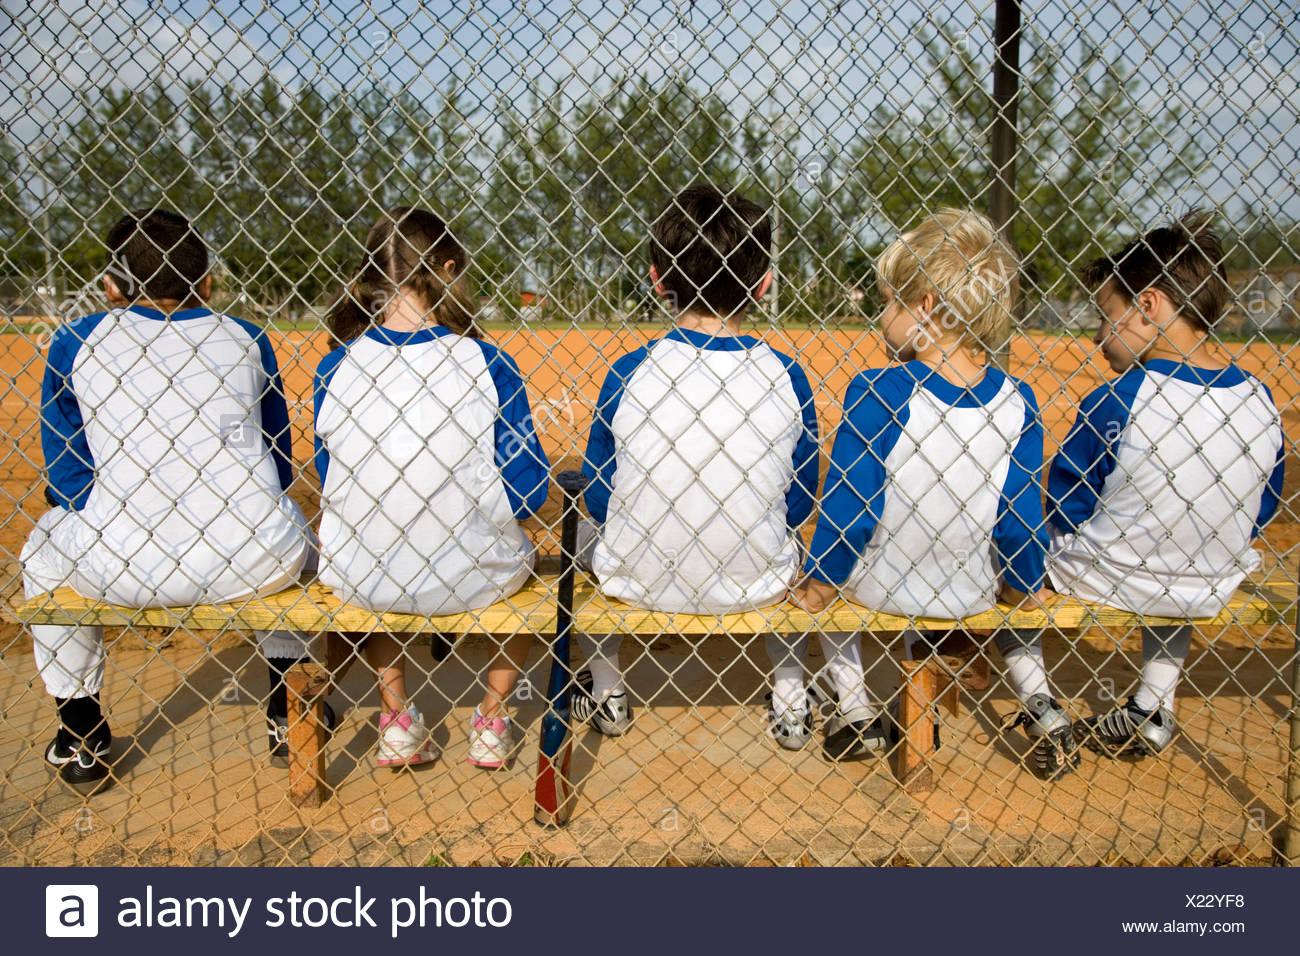 deutsche baseball liga